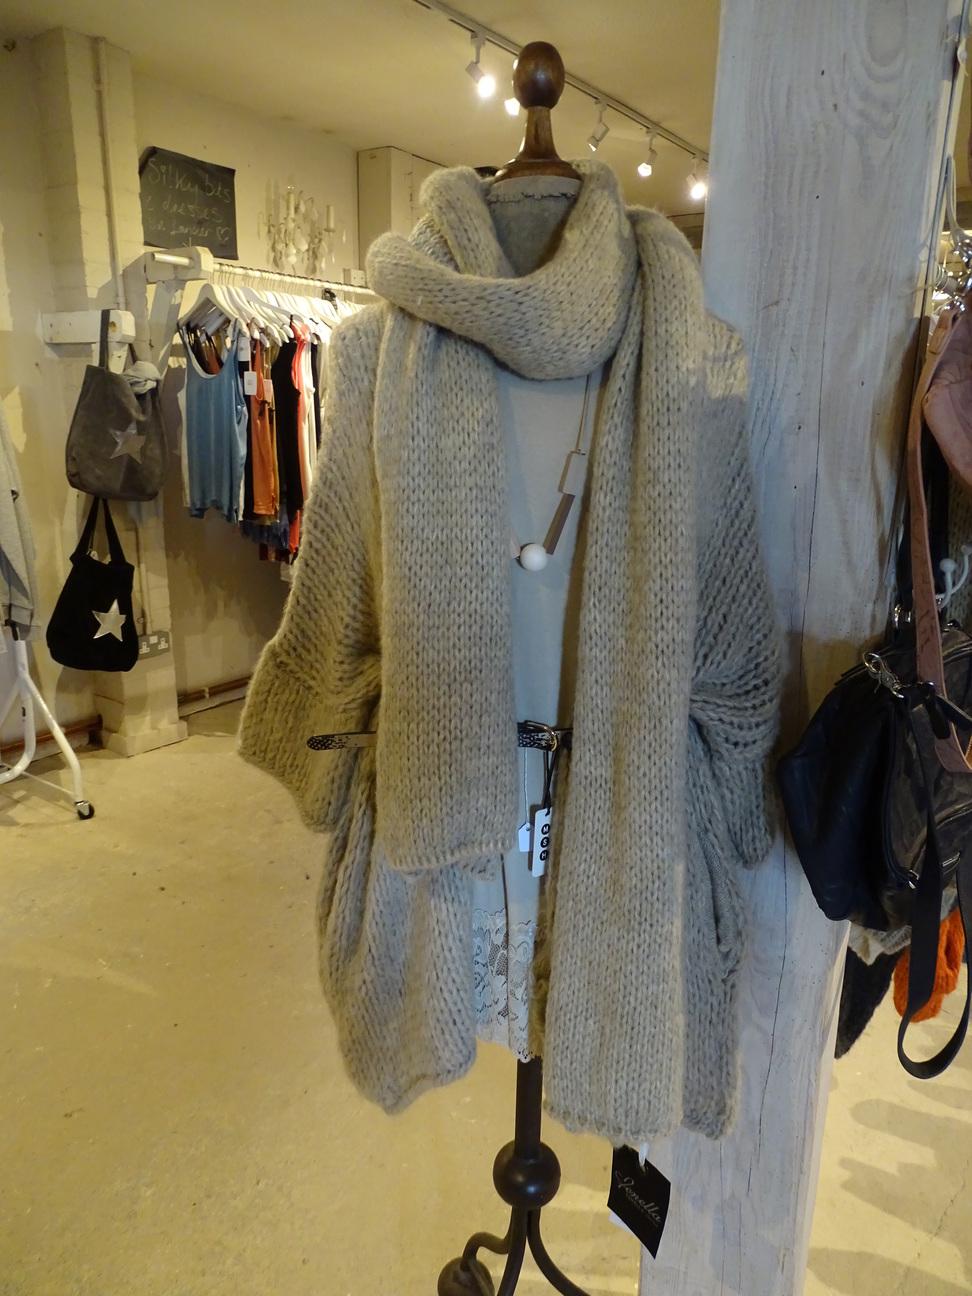 Lavender House Clothing